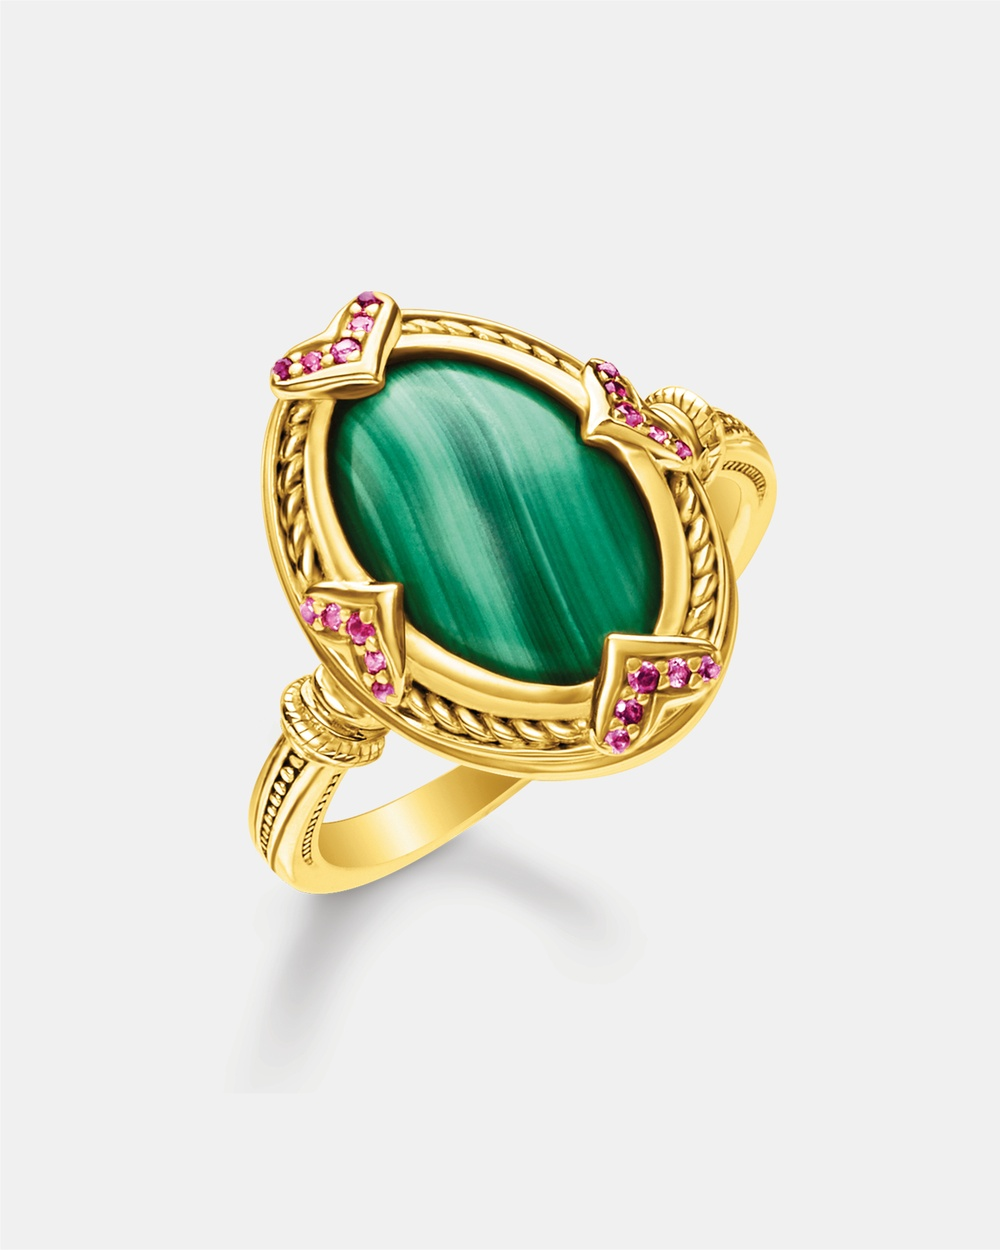 THOMAS SABO Ring Green Stone Jewellery Gold